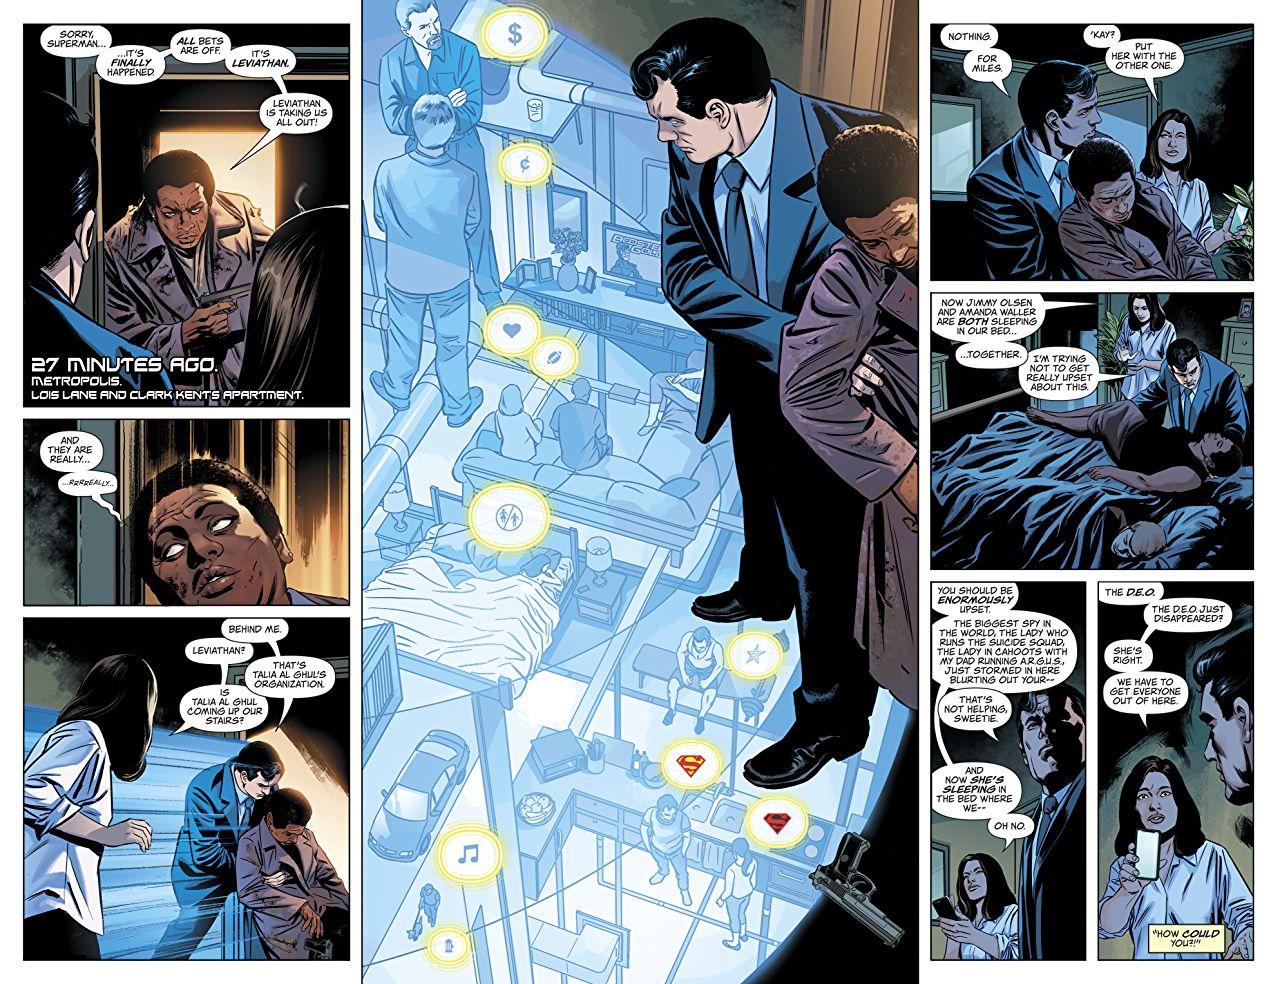 Action Comics 1009 3.jpg